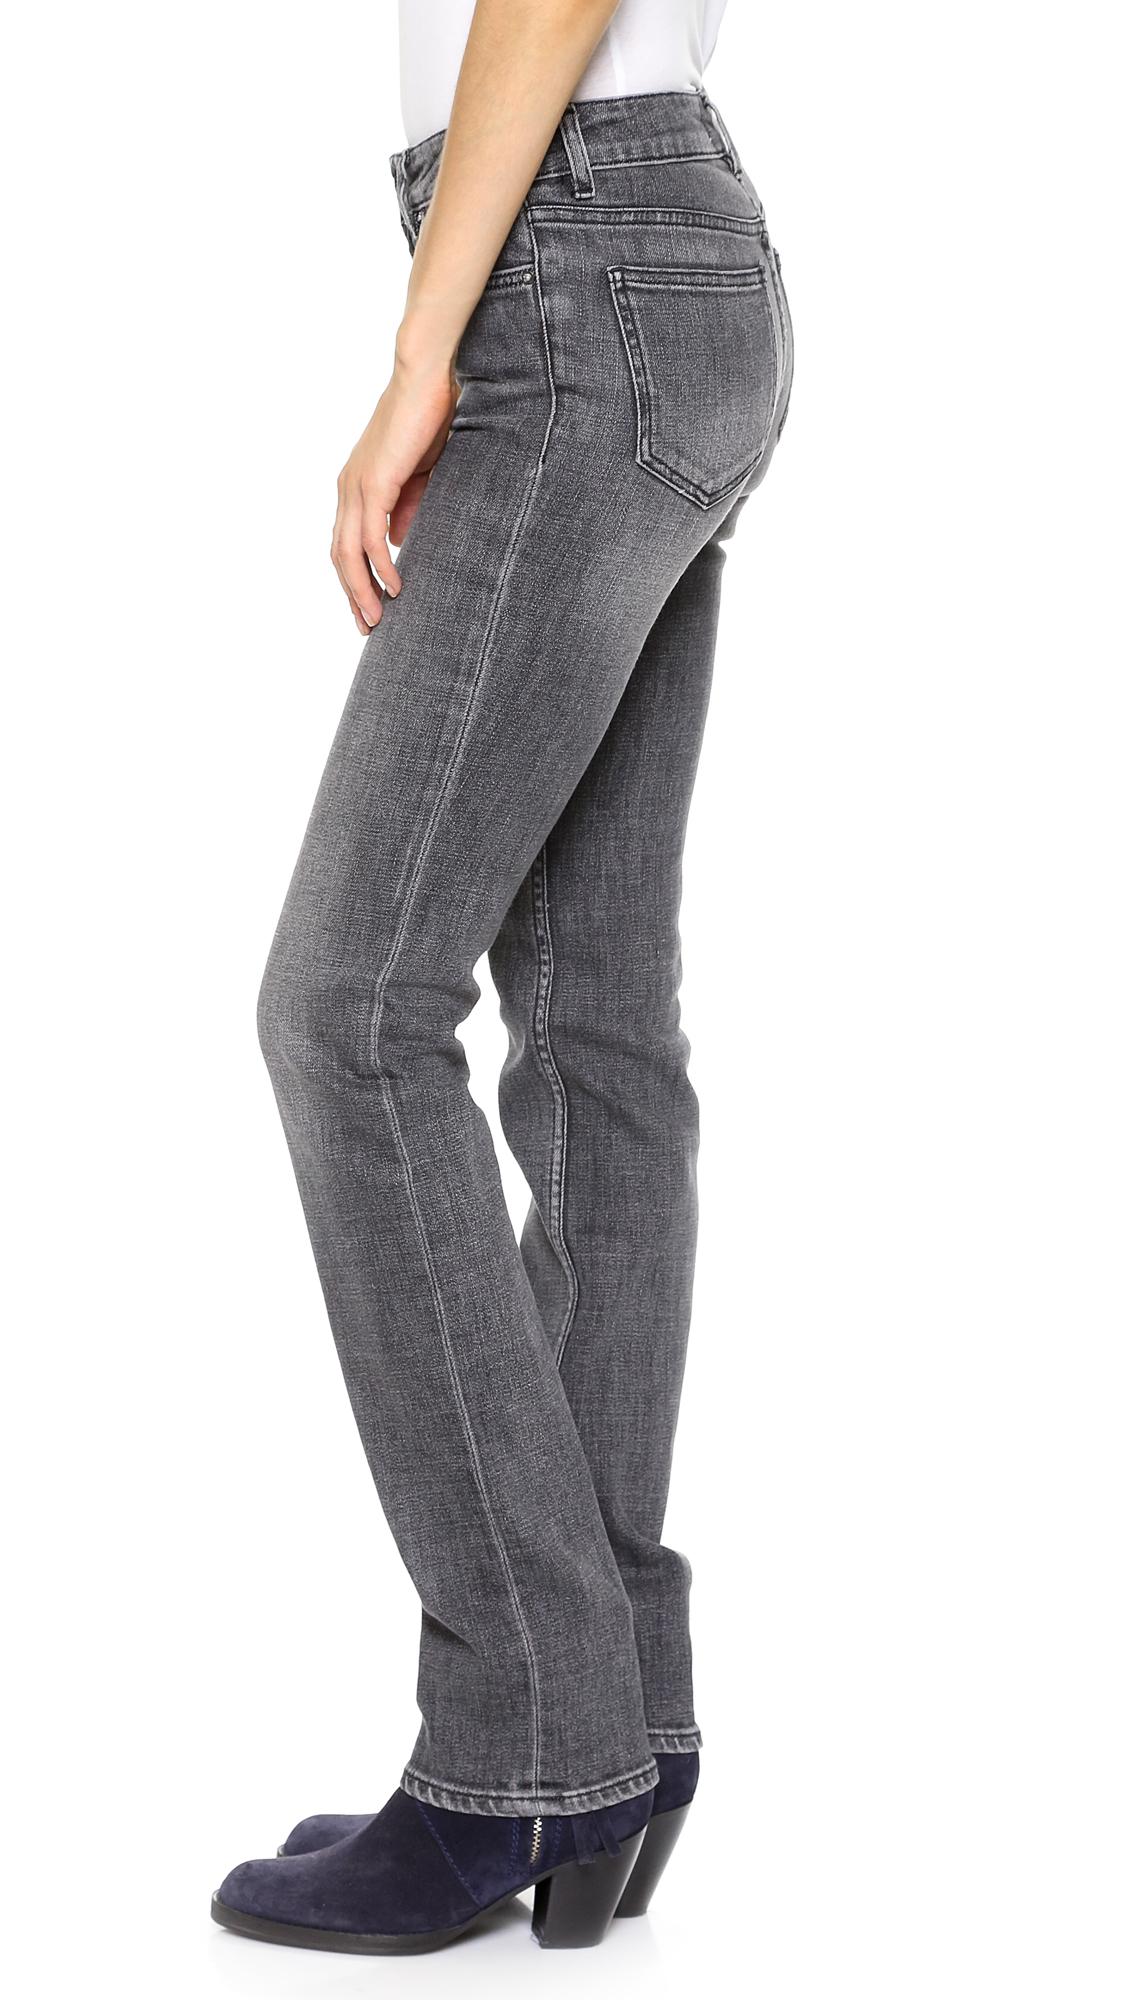 acne jet jeans